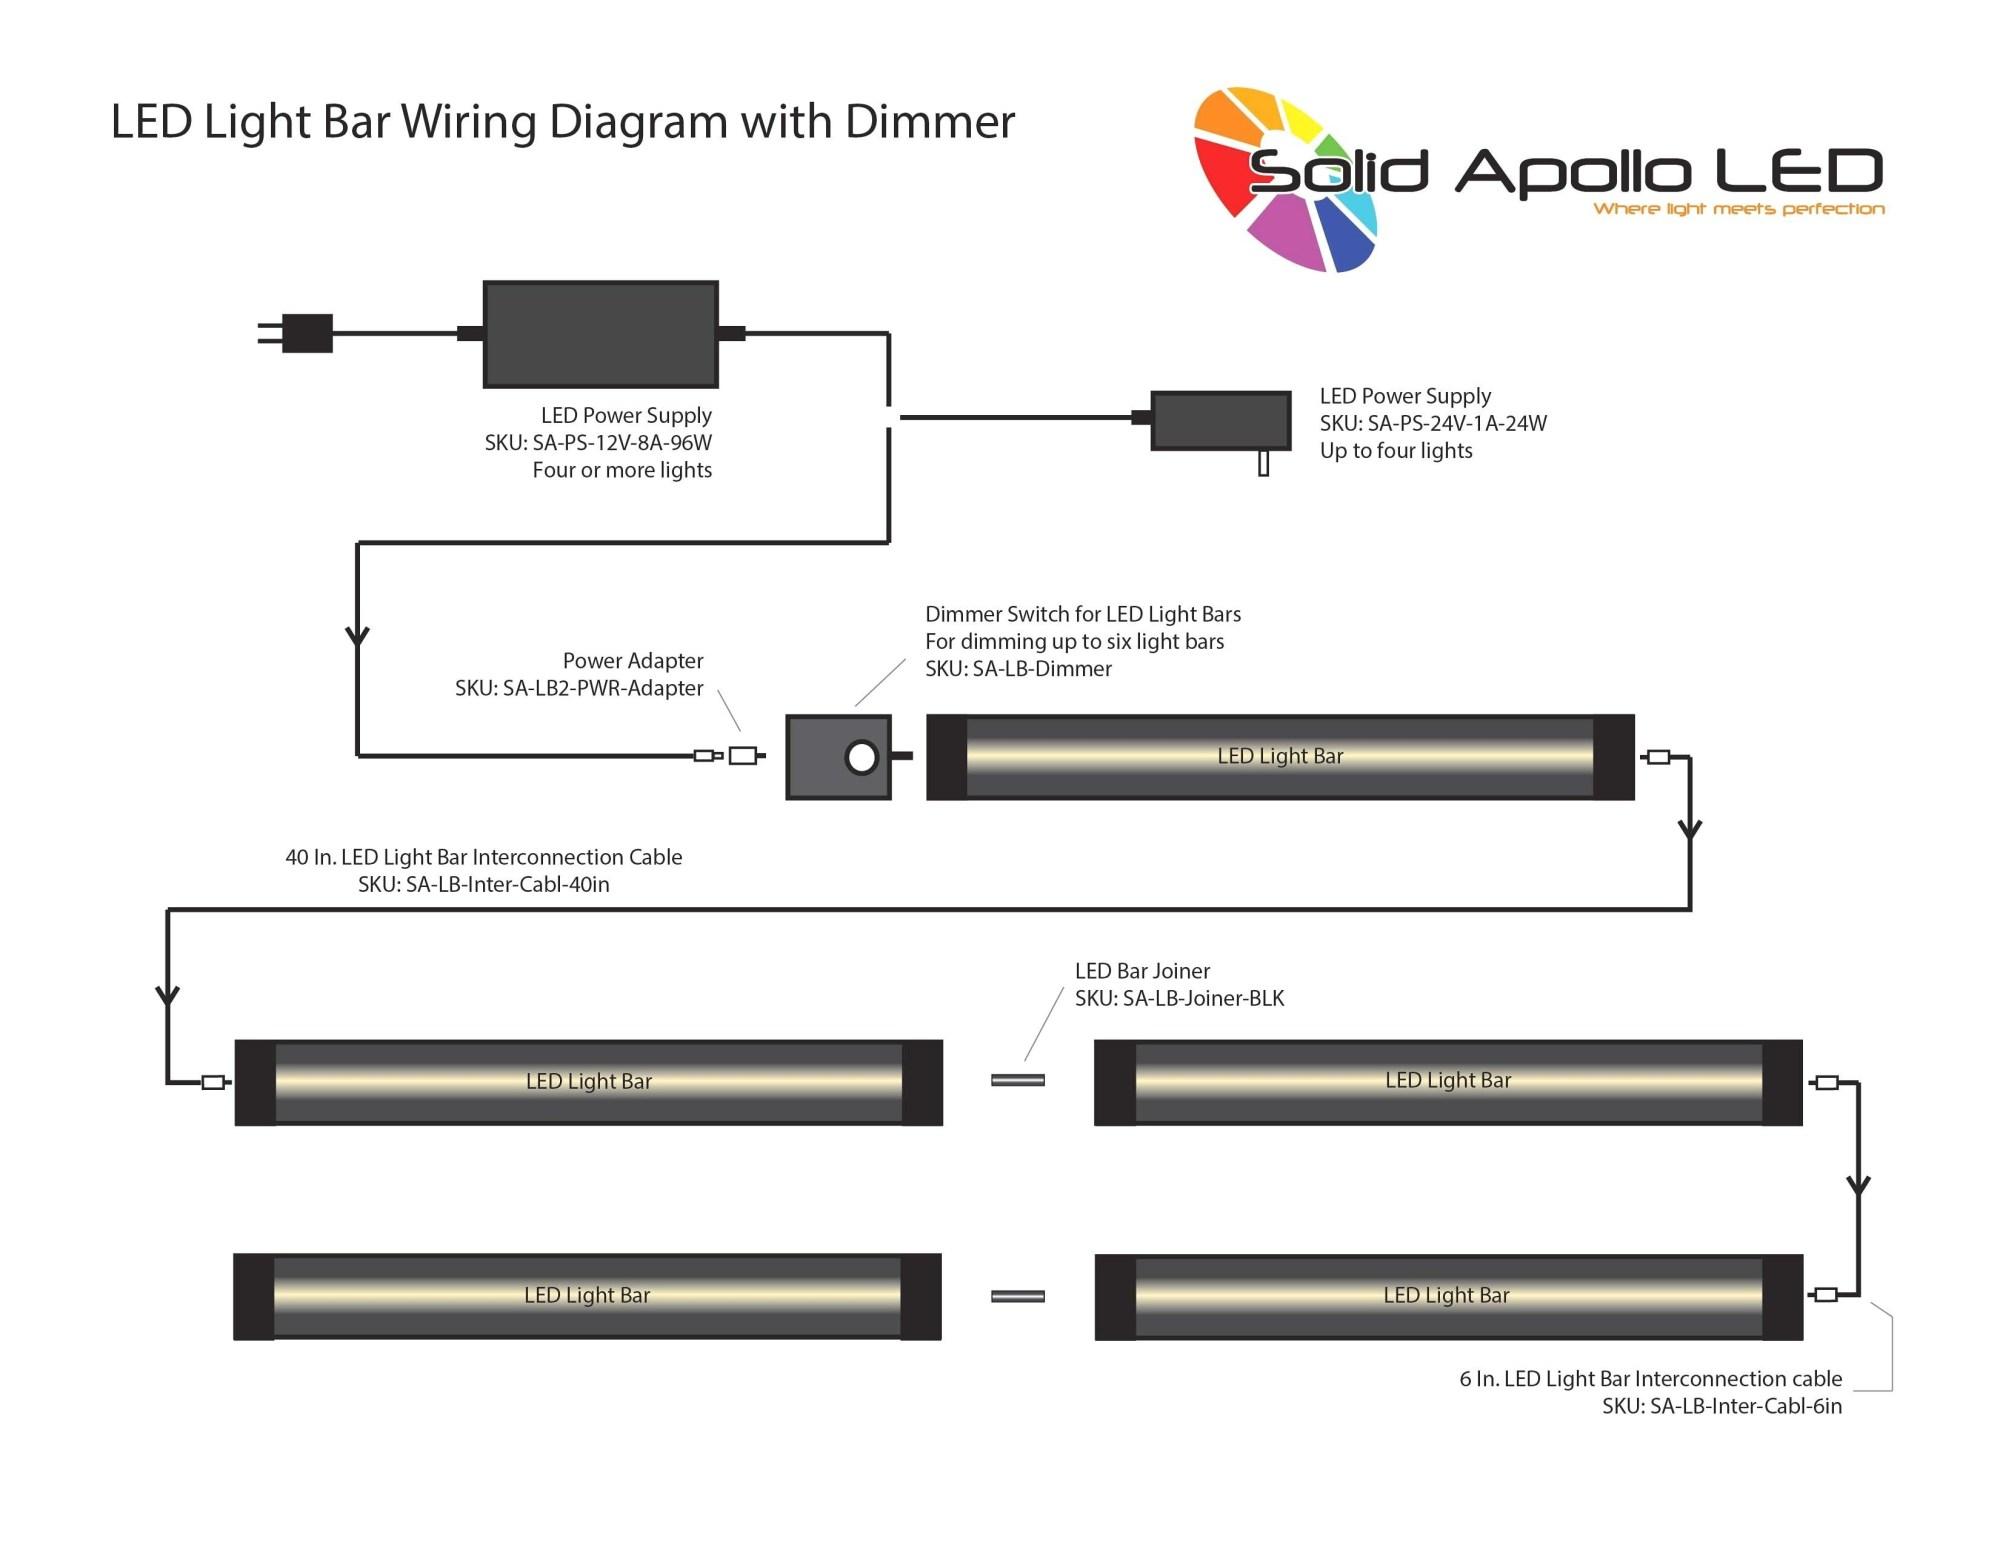 Lithonium Led Light Ballast Wiring Diagram - multi tap ... on